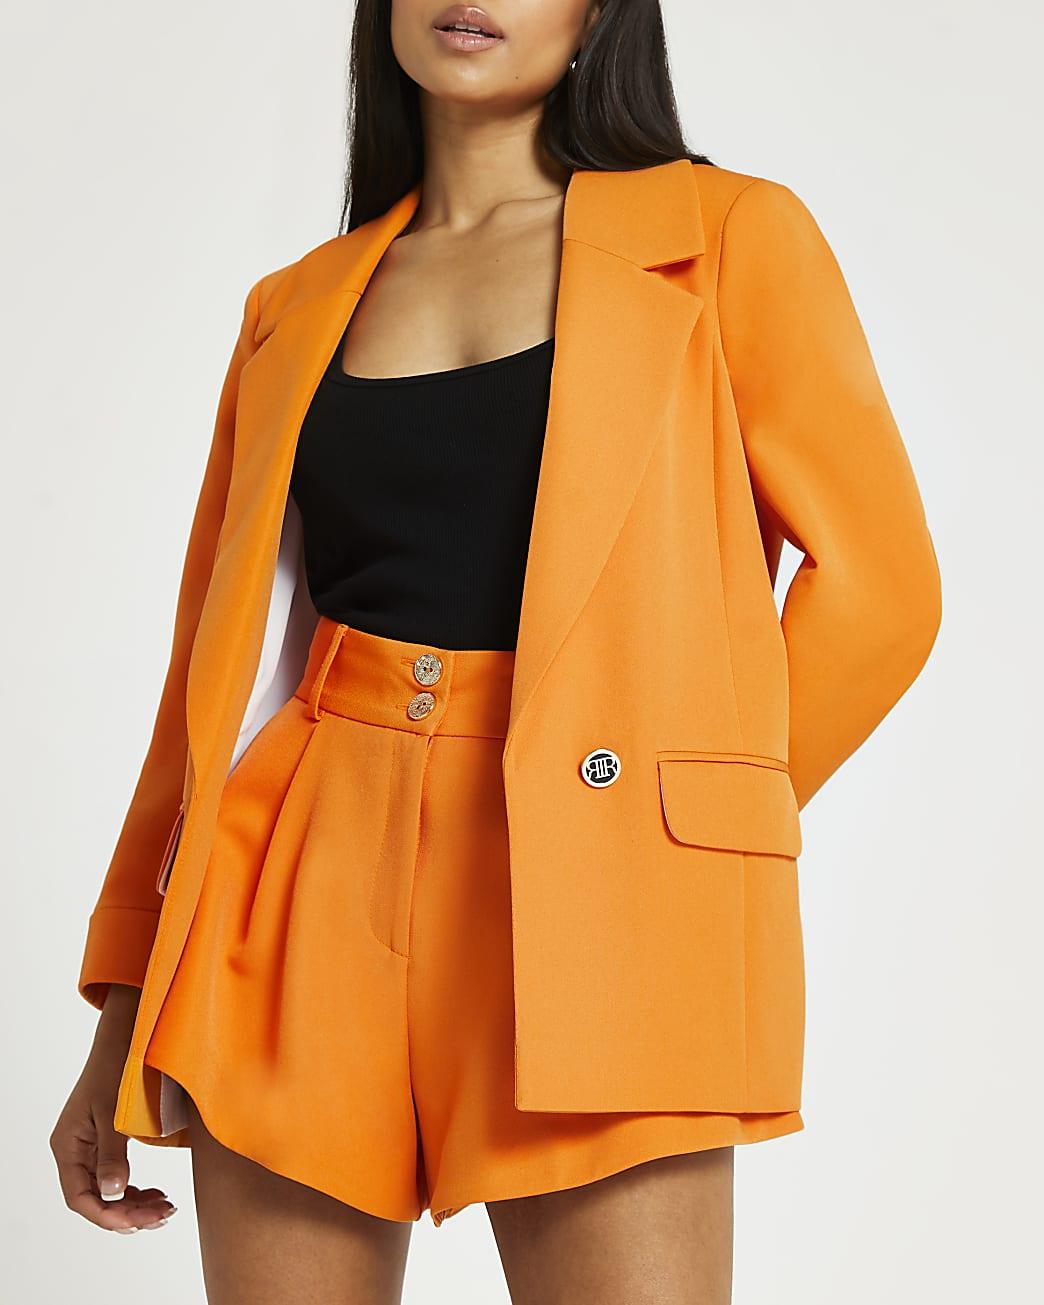 Petite orange blazer